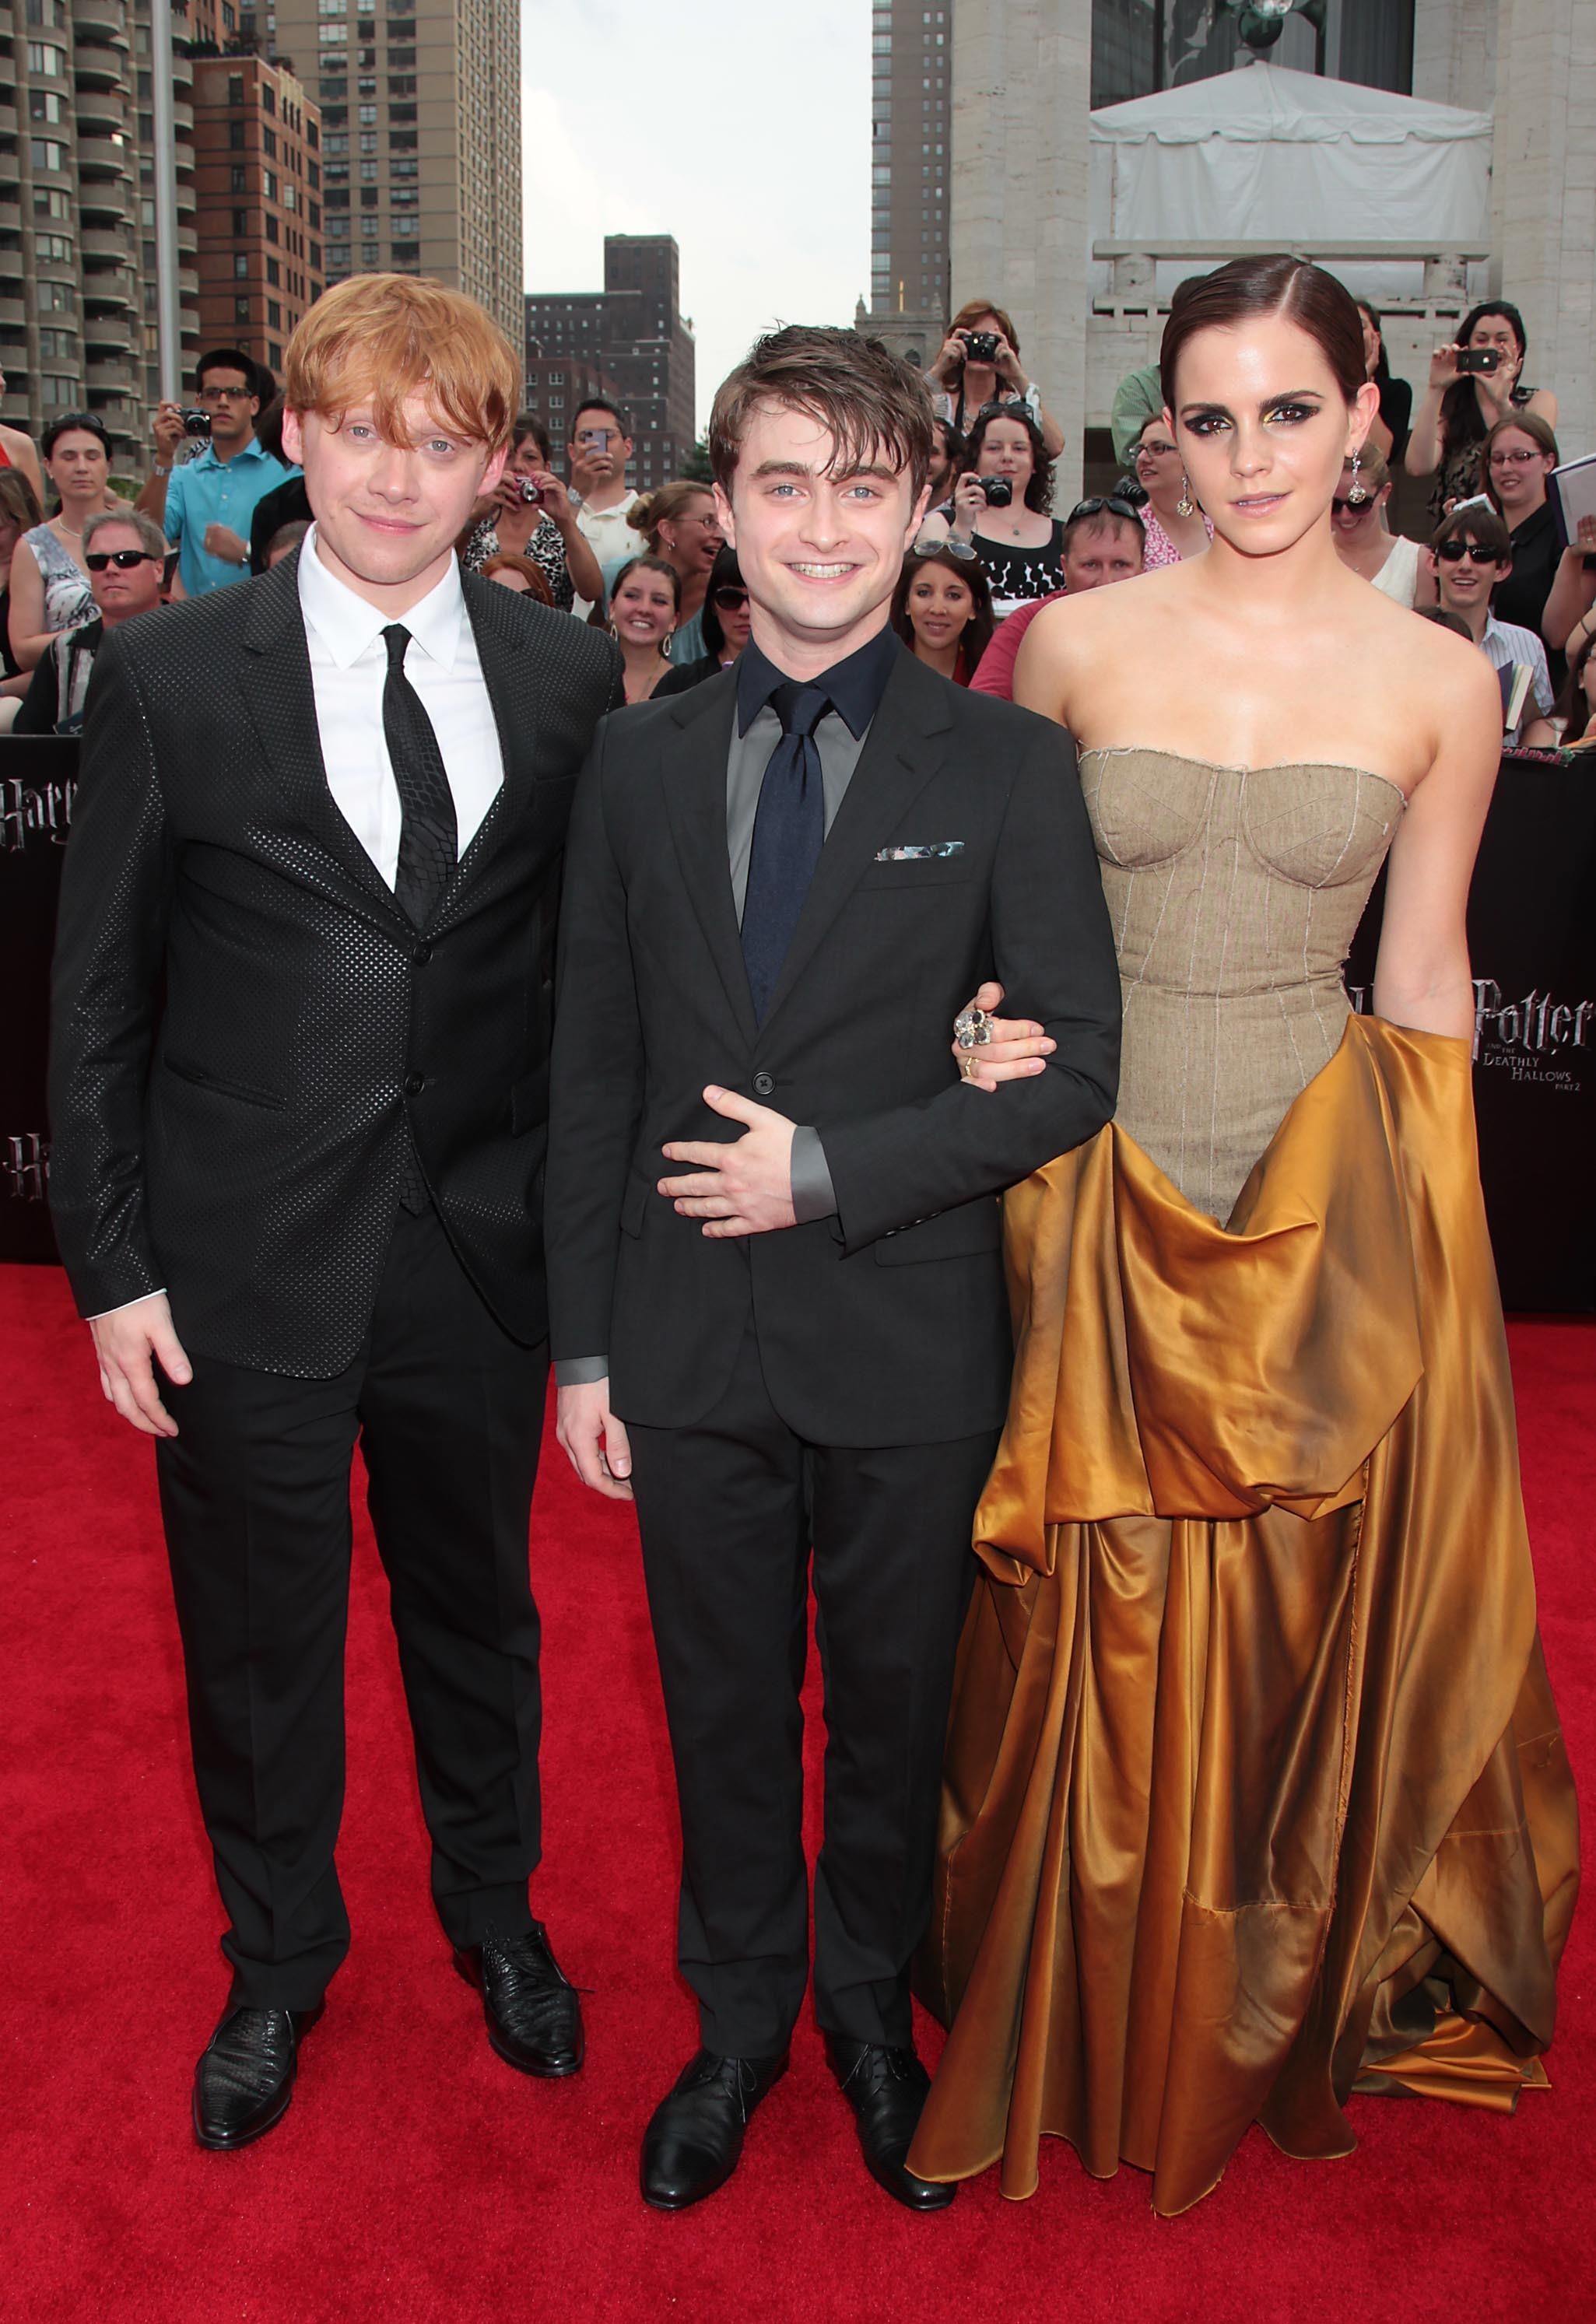 Emma Watson | Overview | Wonderwall.com